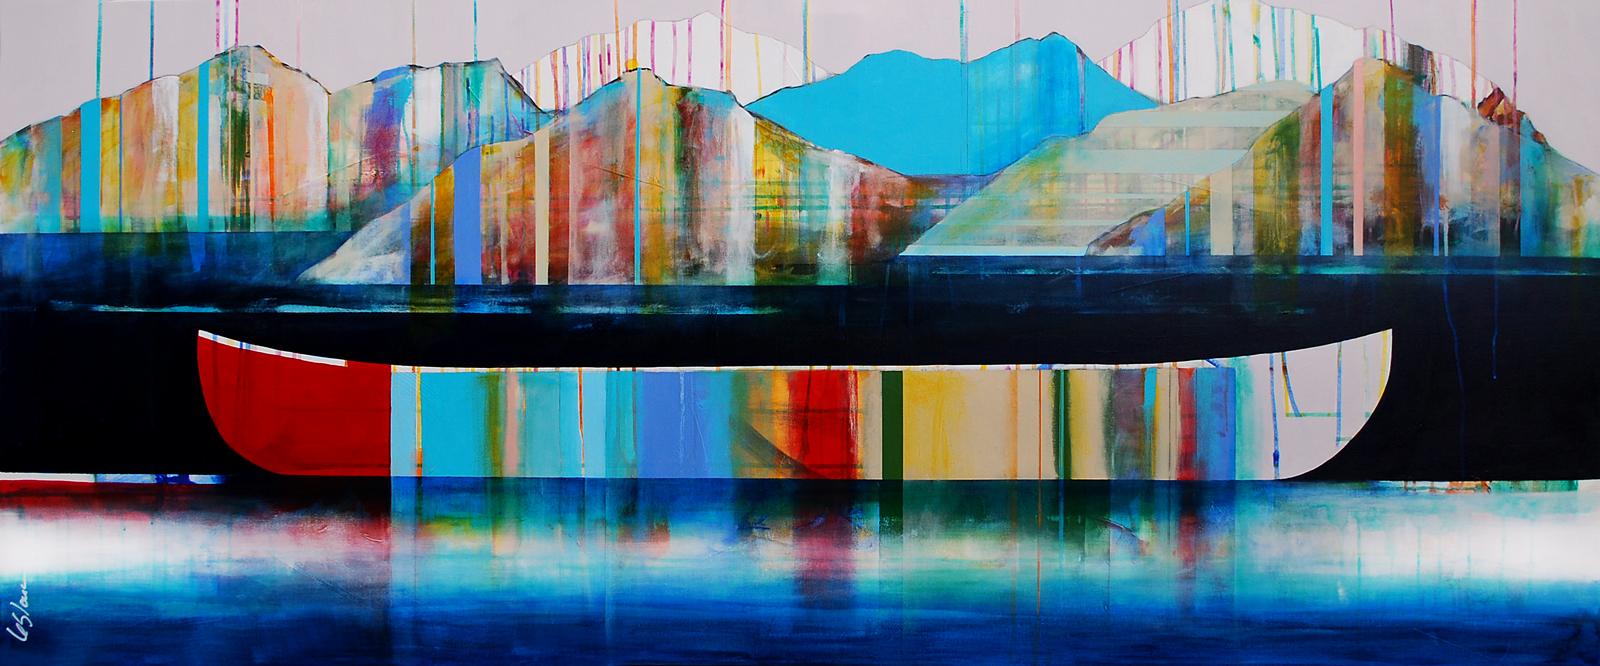 Paysage grandiose, mixed media canoe painting by Sylvain Leblanc | Effusion Art Gallery + Cast Glass Studio, Invermere BC